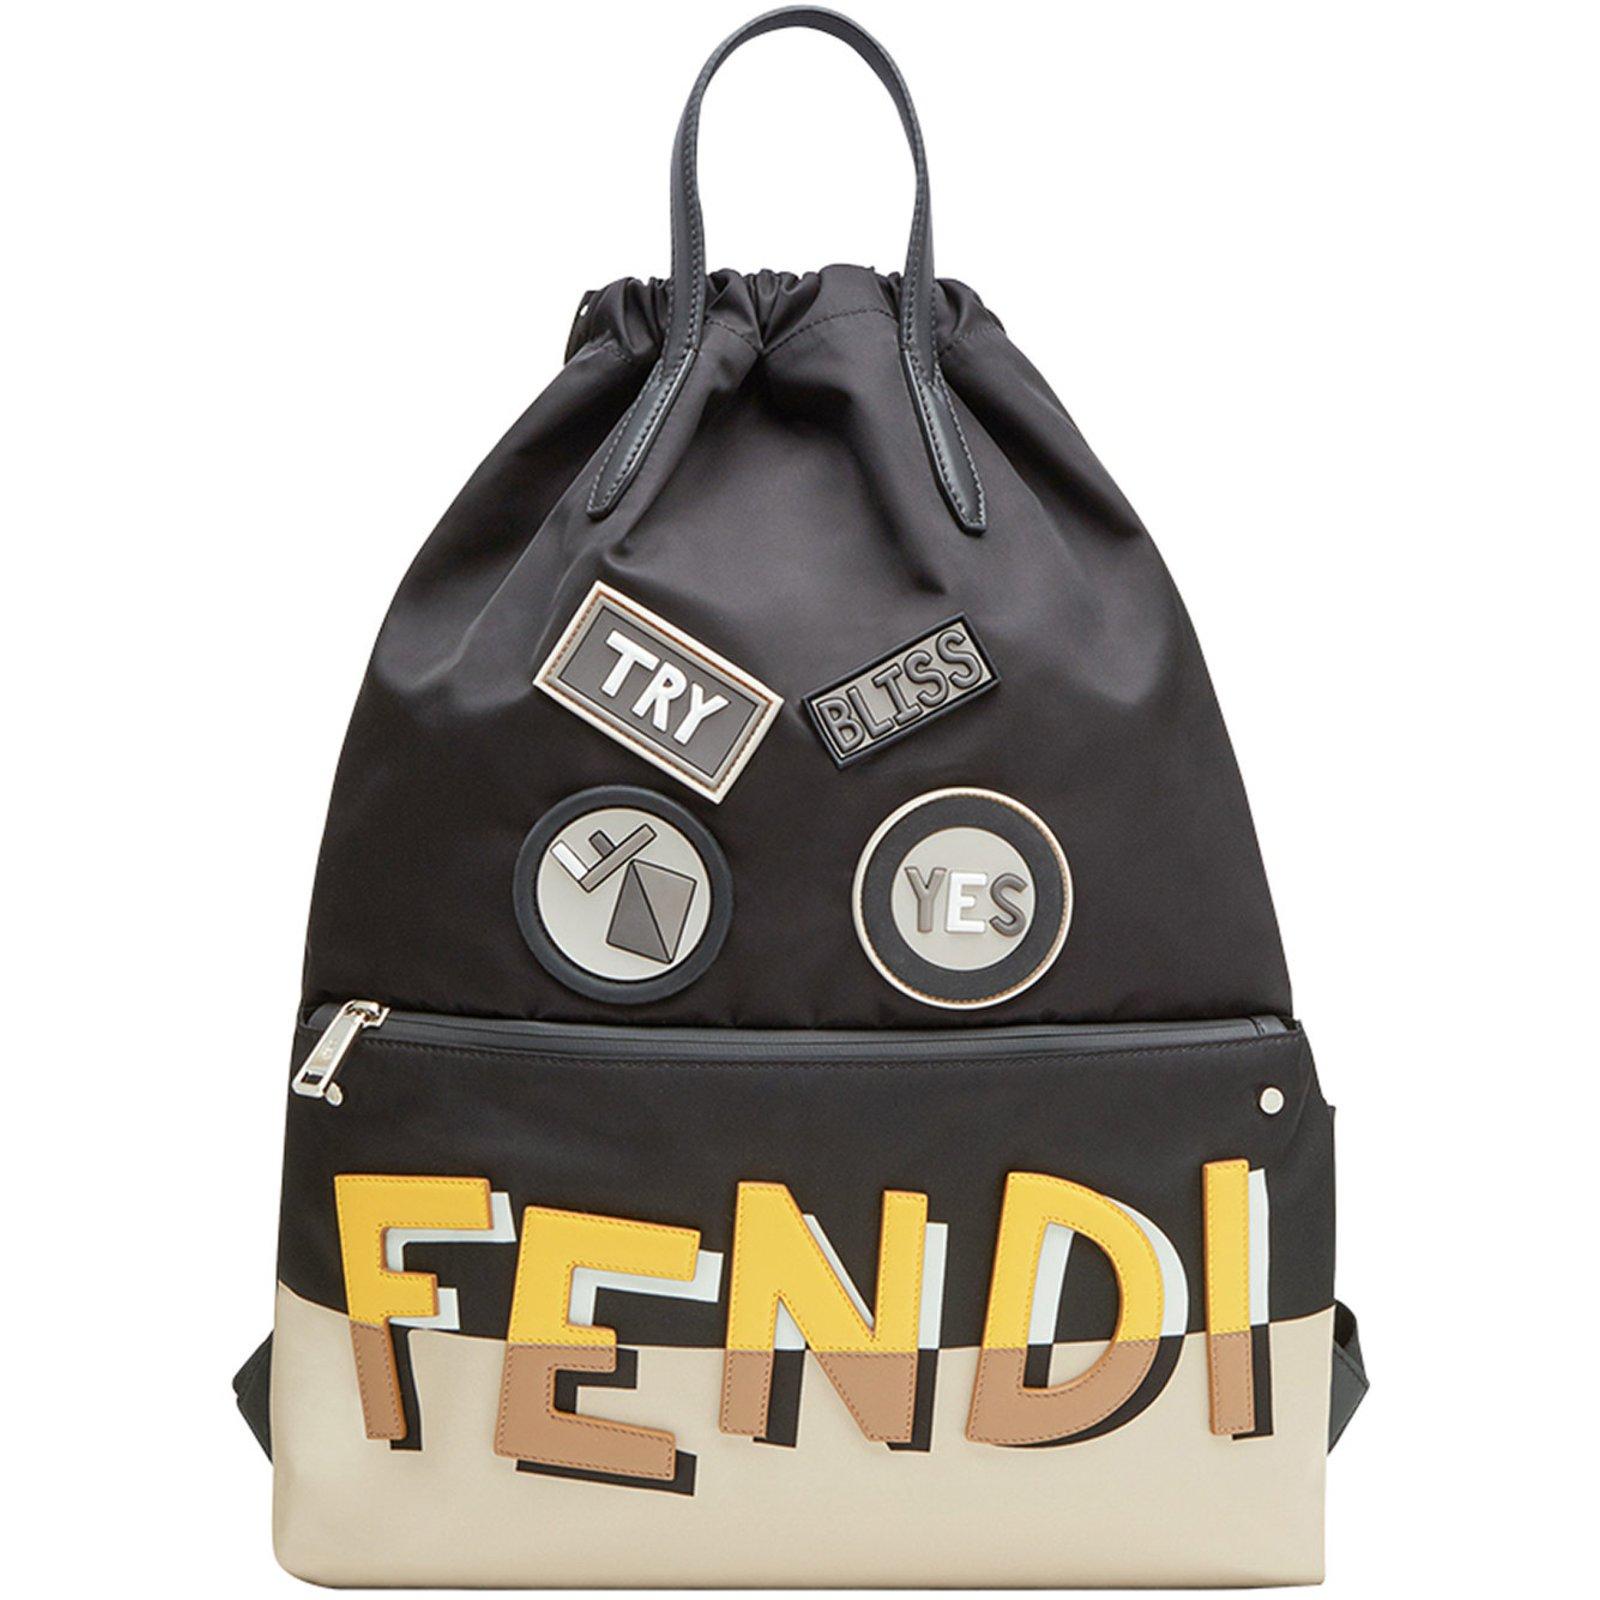 9bdf04ae181 Fendi Fendi backpack new Bags Briefcases nylon Black ref.72279 ...